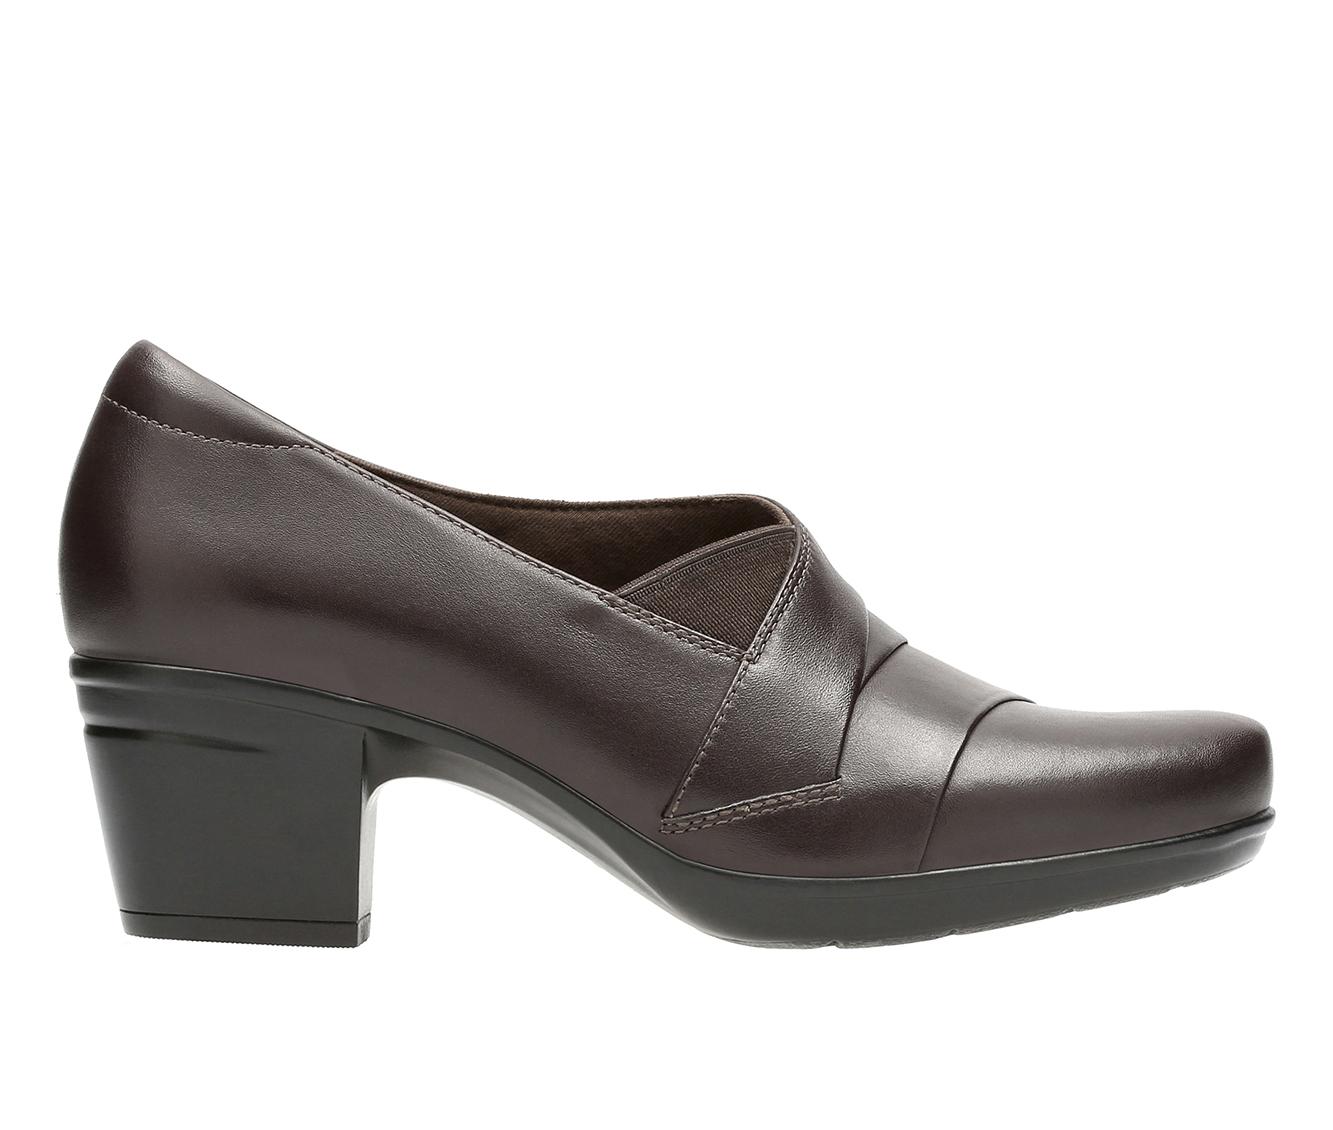 Clarks Emslie Warbler Women's Shoe (Beige Leather)